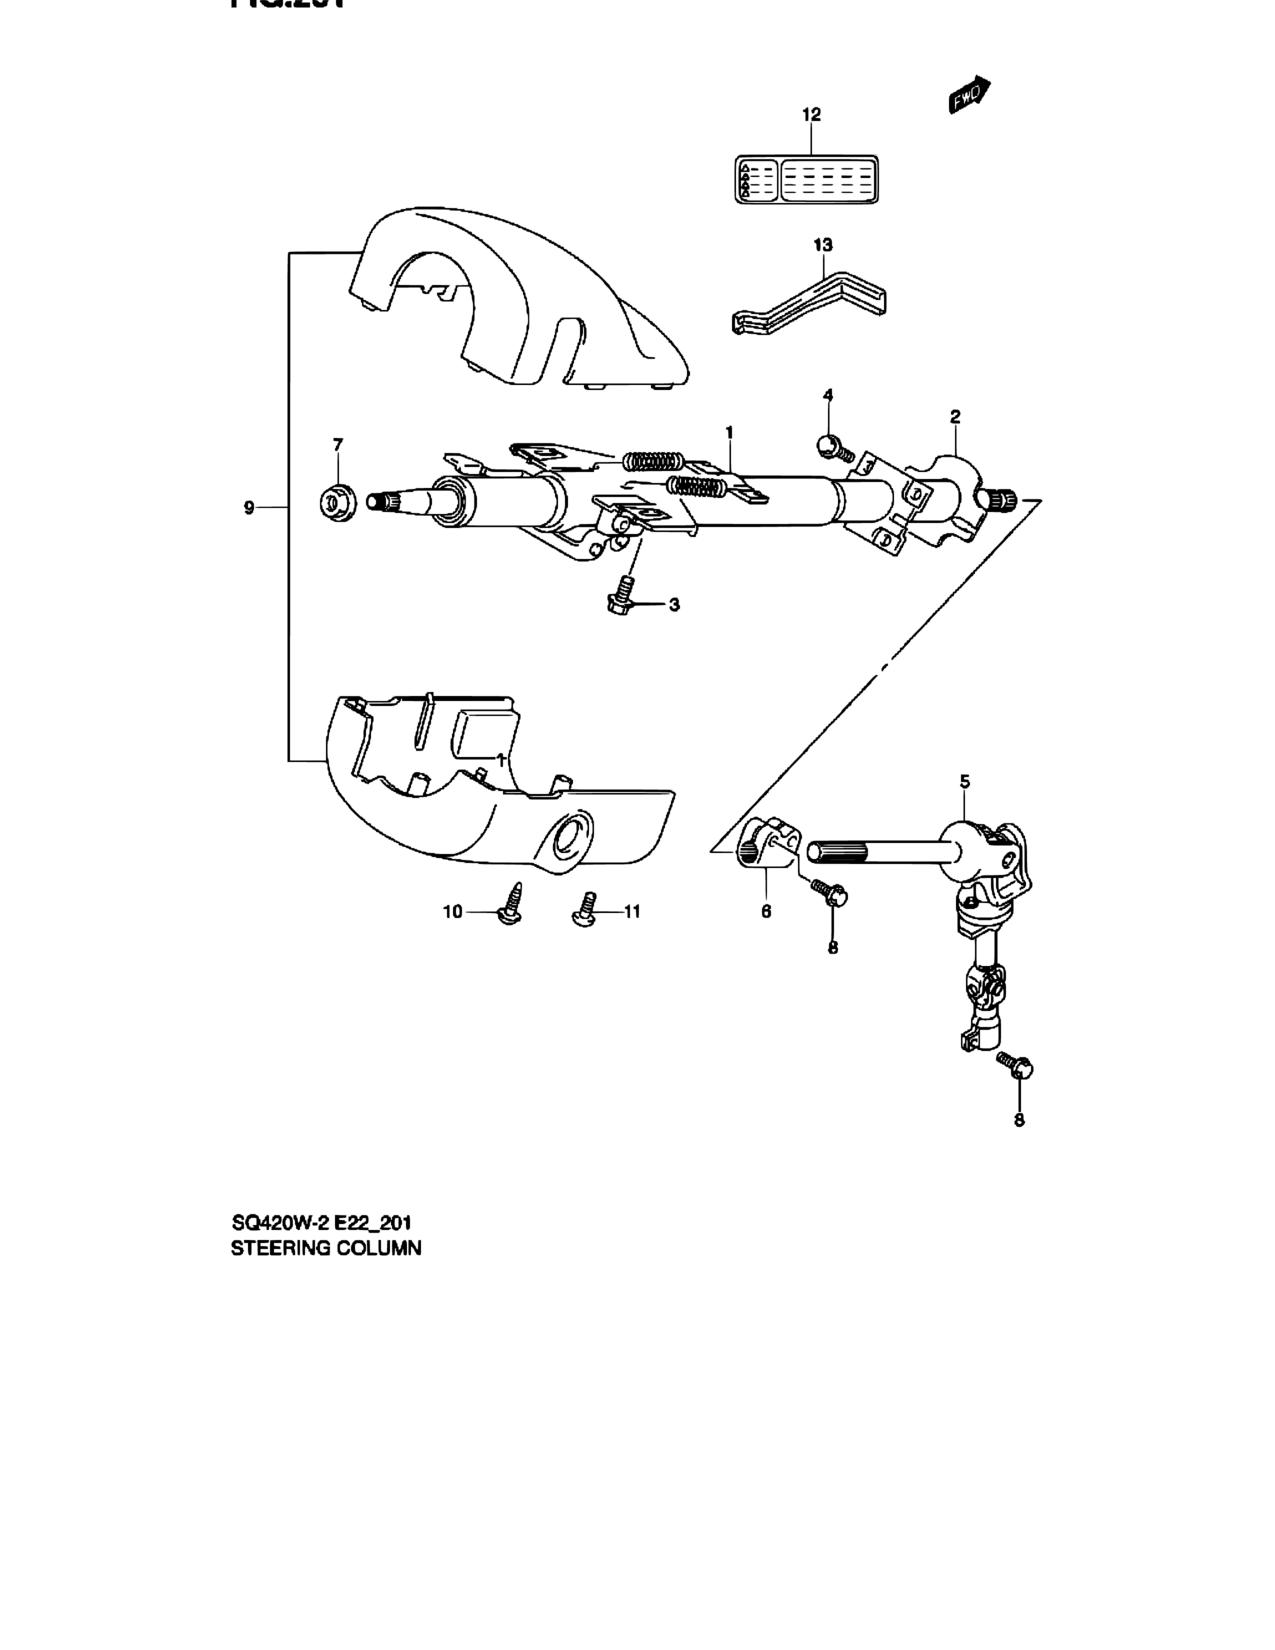 hight resolution of kenworth steering column diagram wiring diagrams bright kenworth steering column diagram